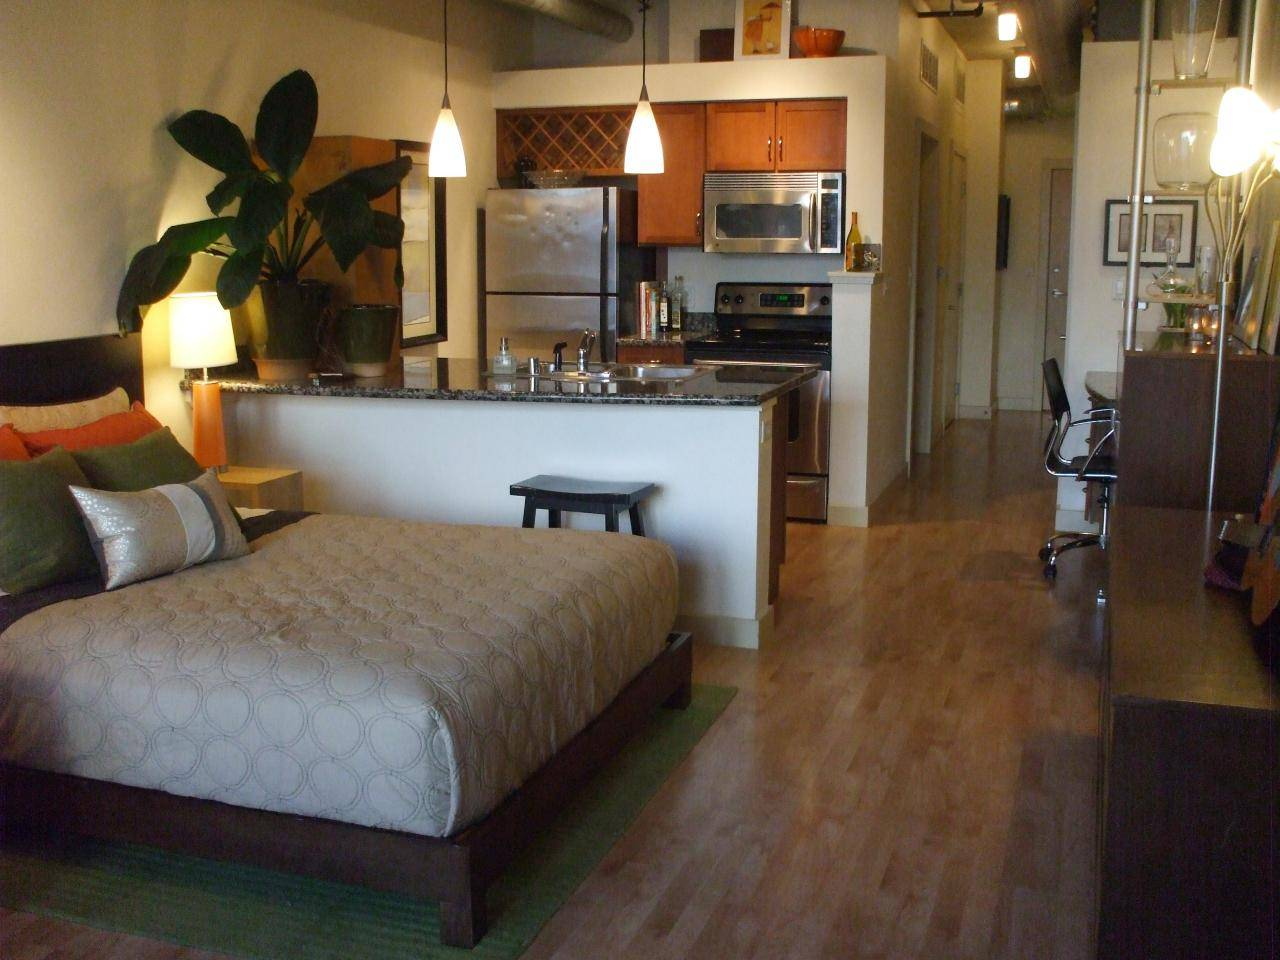 Studio Design Ideas Interior Styles Color Schemes House Plans 62396